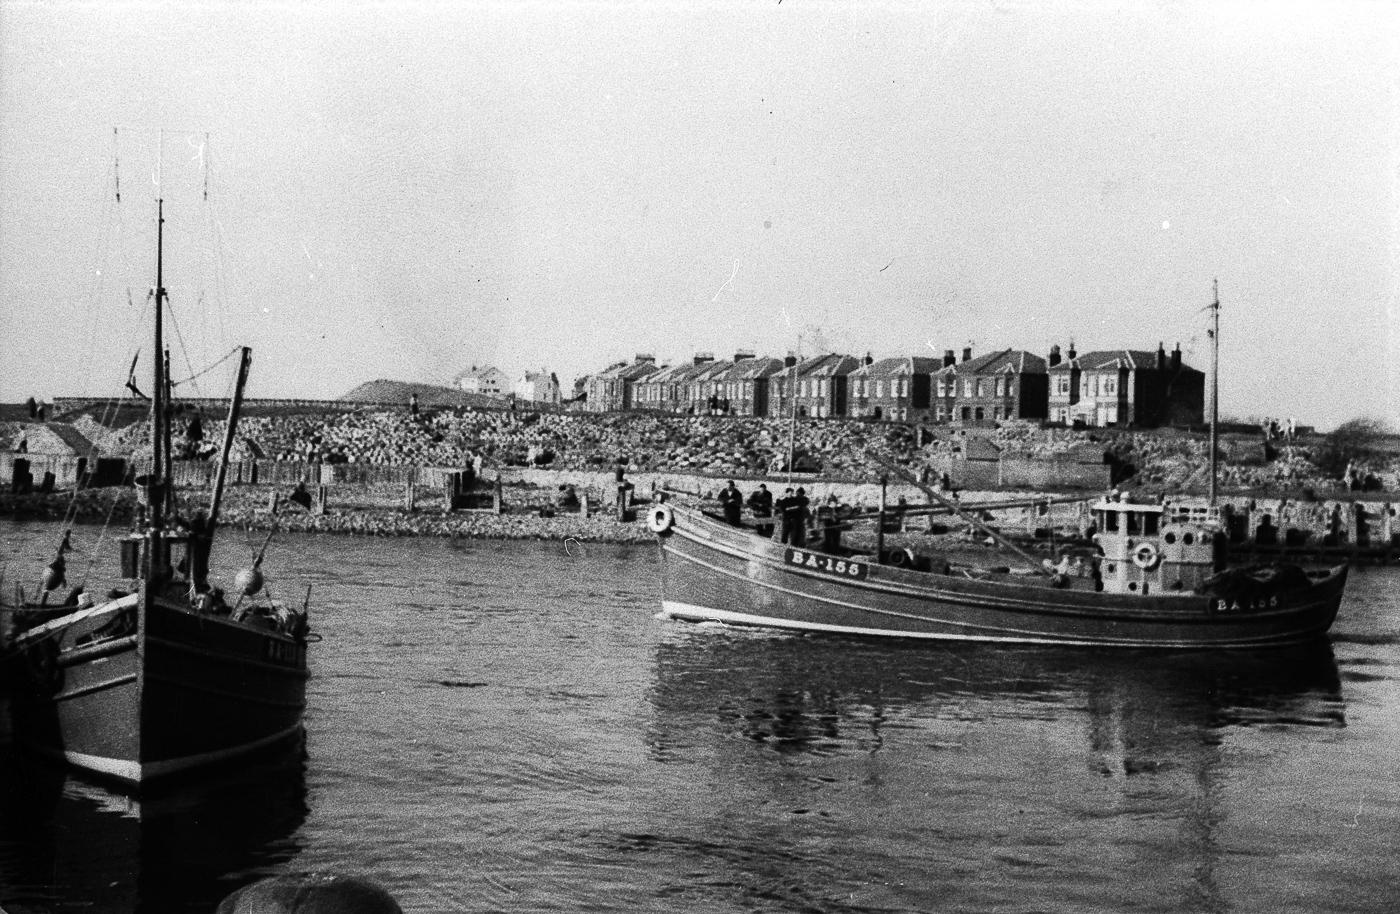 Aliped VIII BA155 leaving harbour, Girvan, 1964